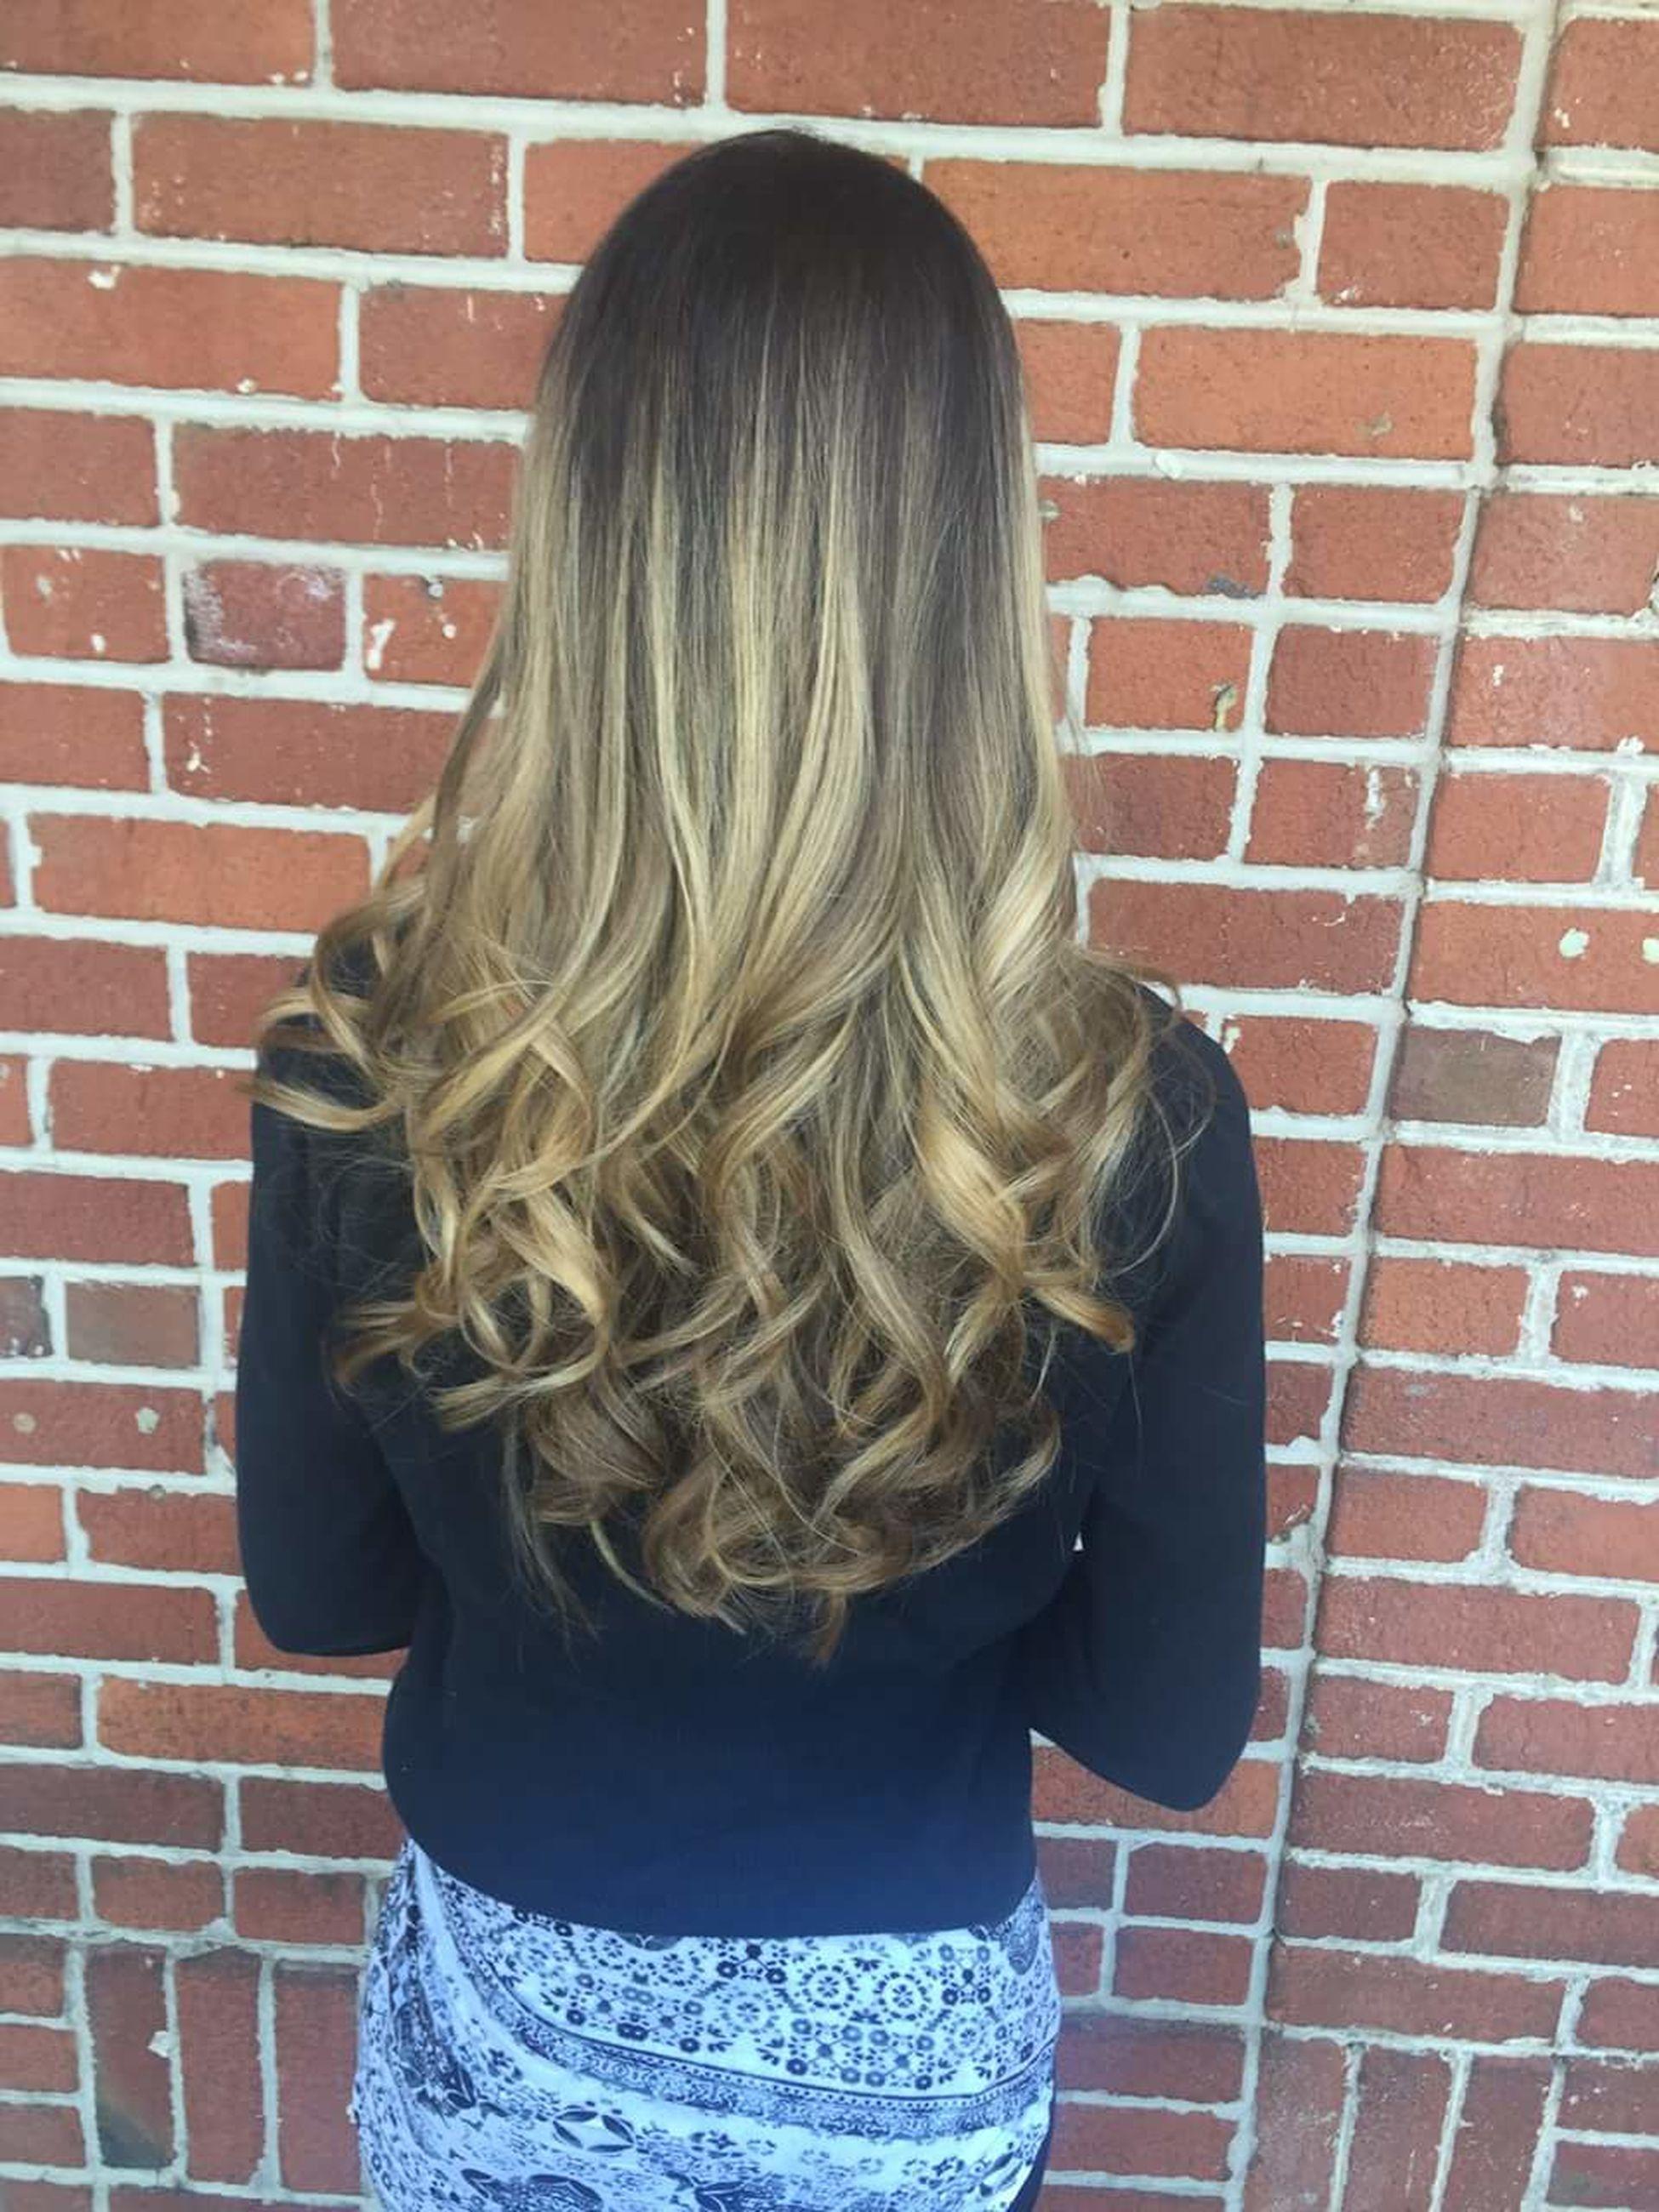 Hair HairLove Hairbyme Downtownsalonandgallery Nofilternoedit Balayage